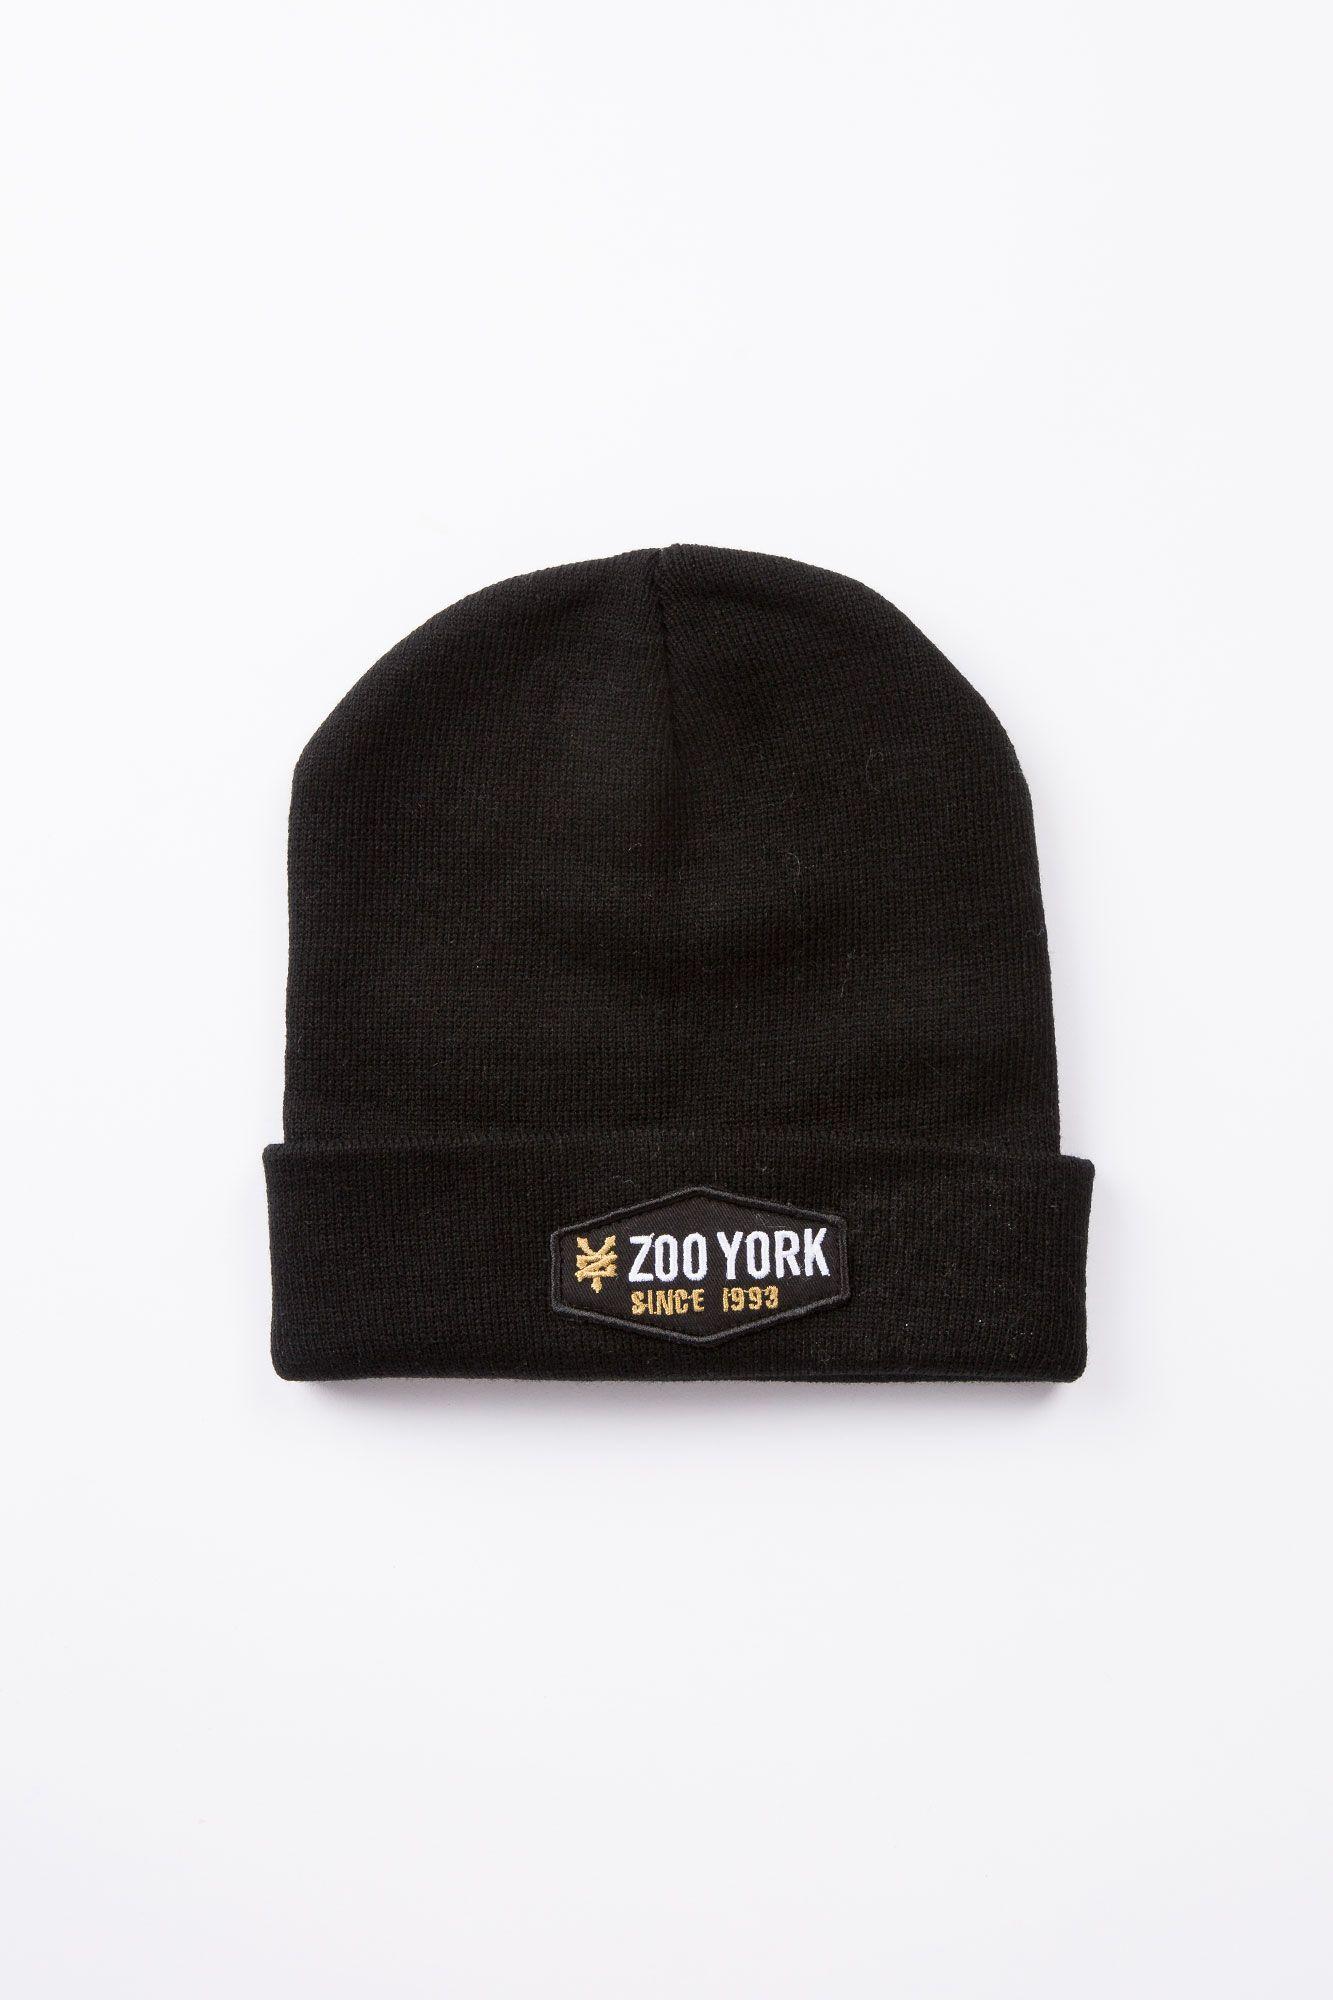 3c0fc5cc7f1 Guys Zoo York Cuff Beanie